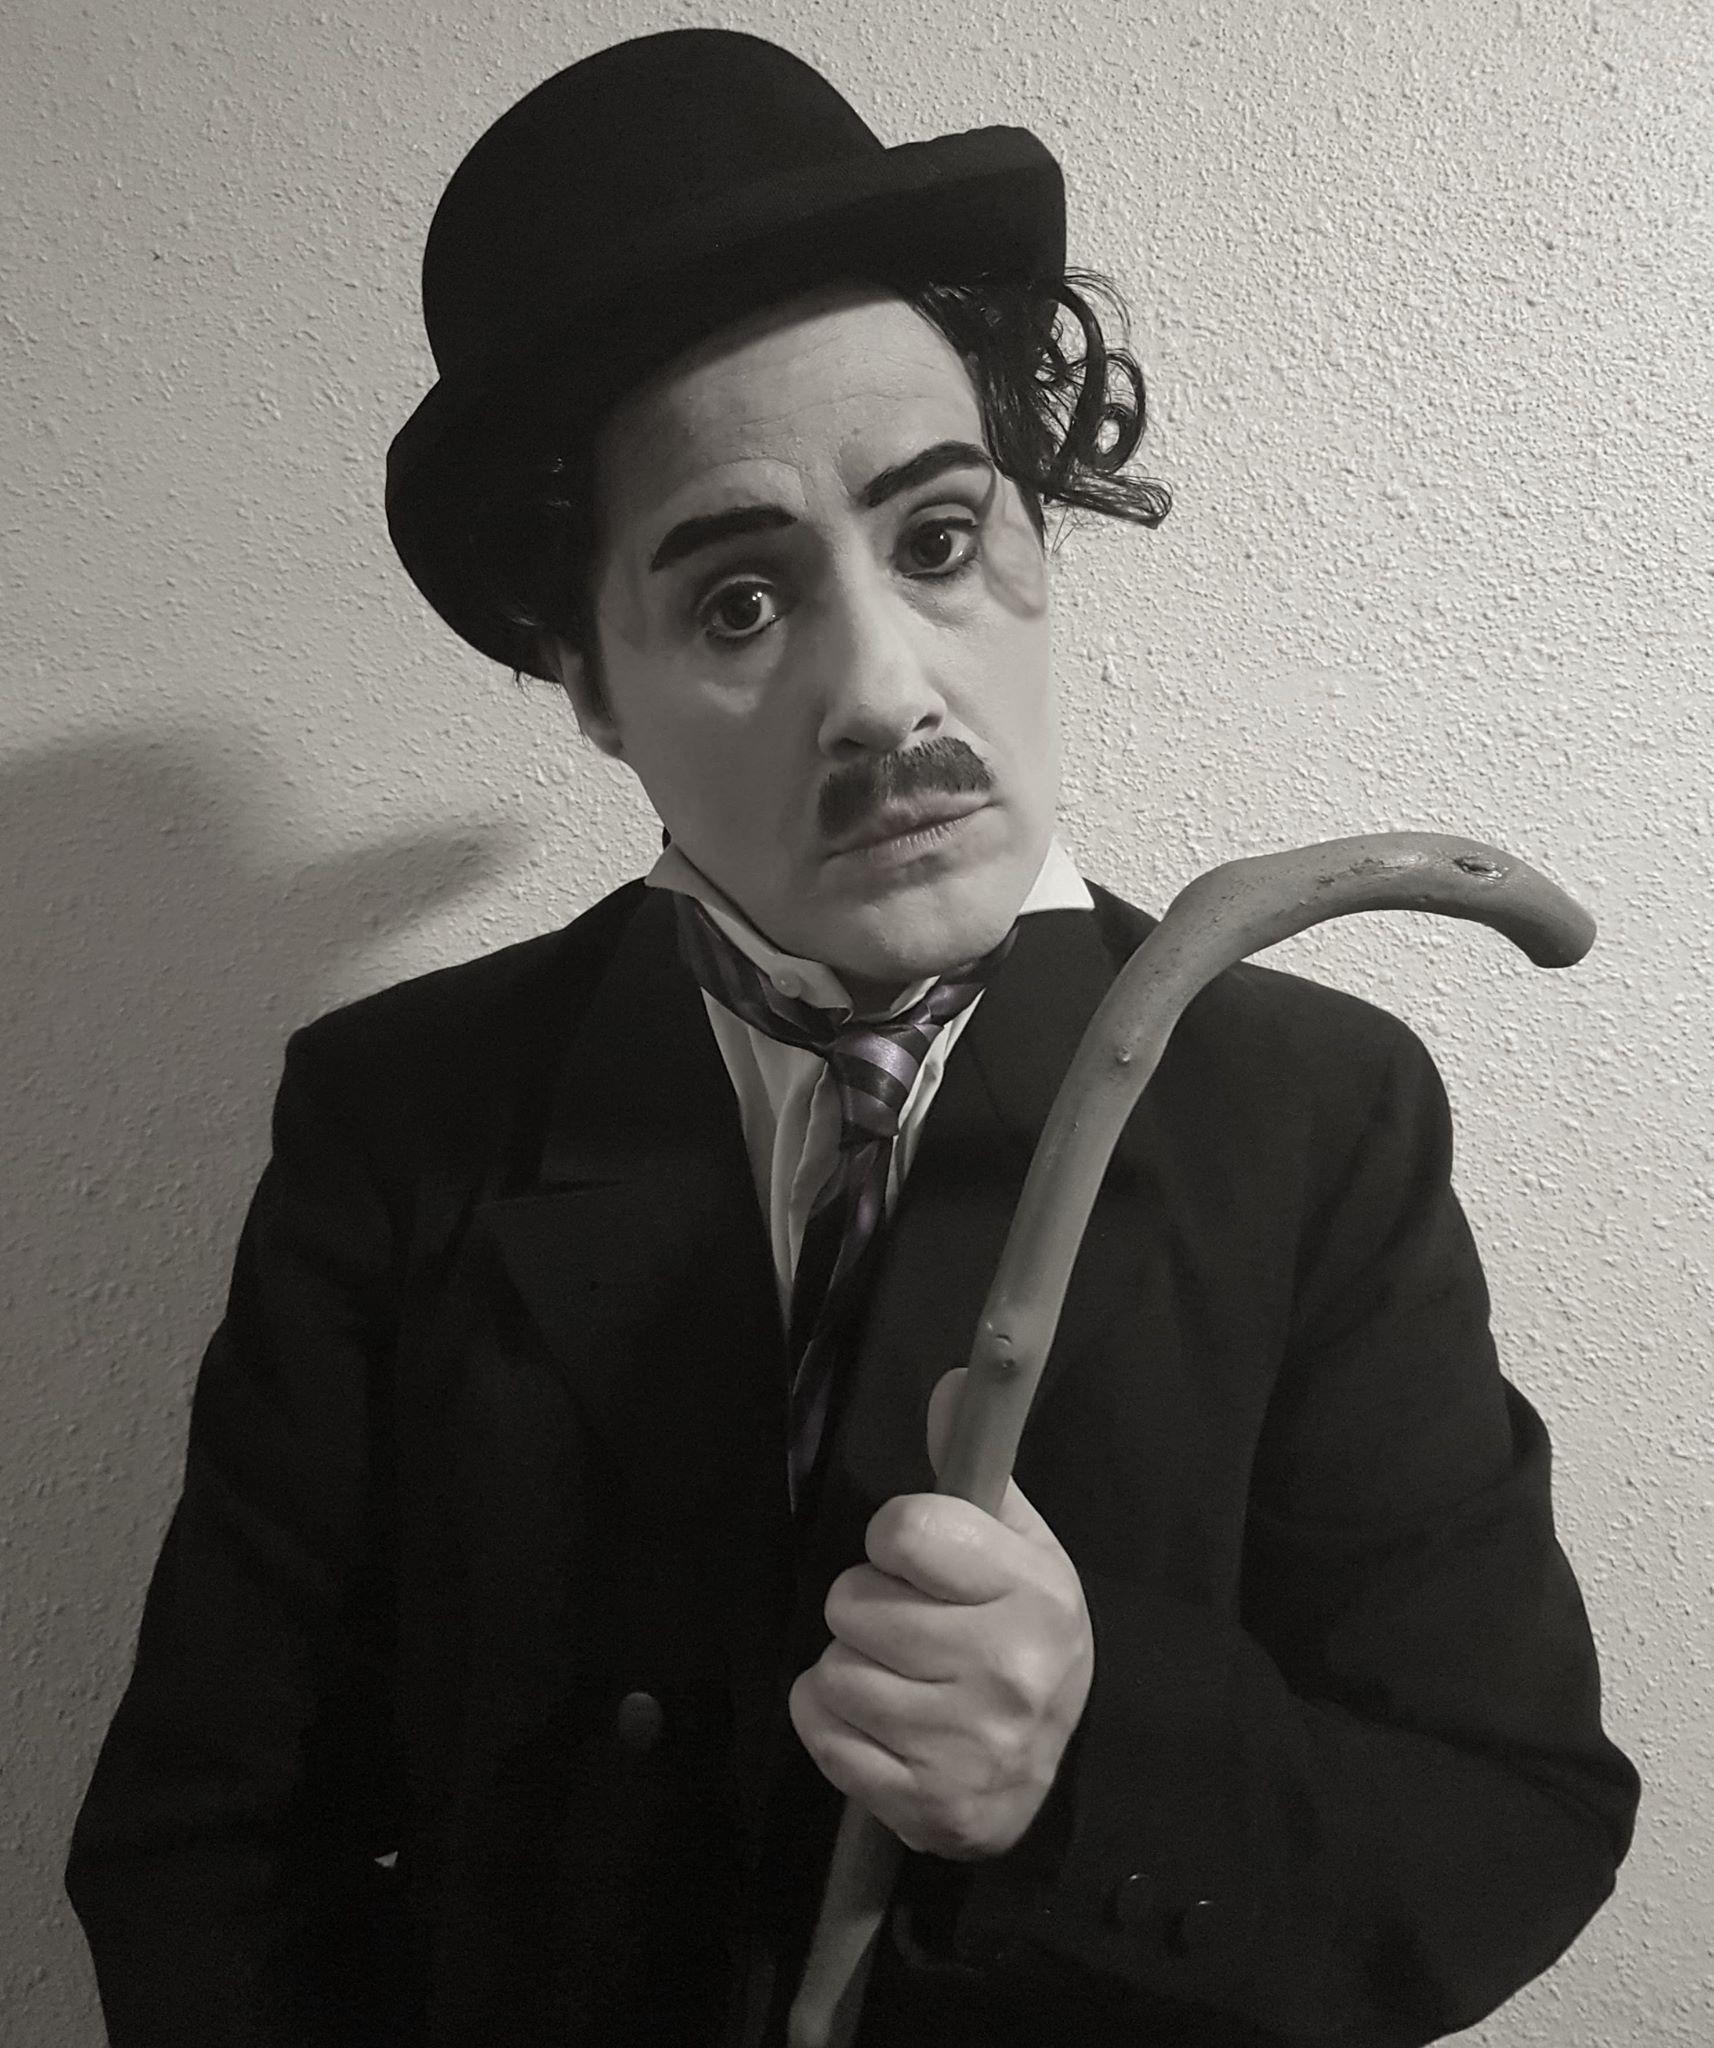 Jack Cutler as Charlie Chaplin